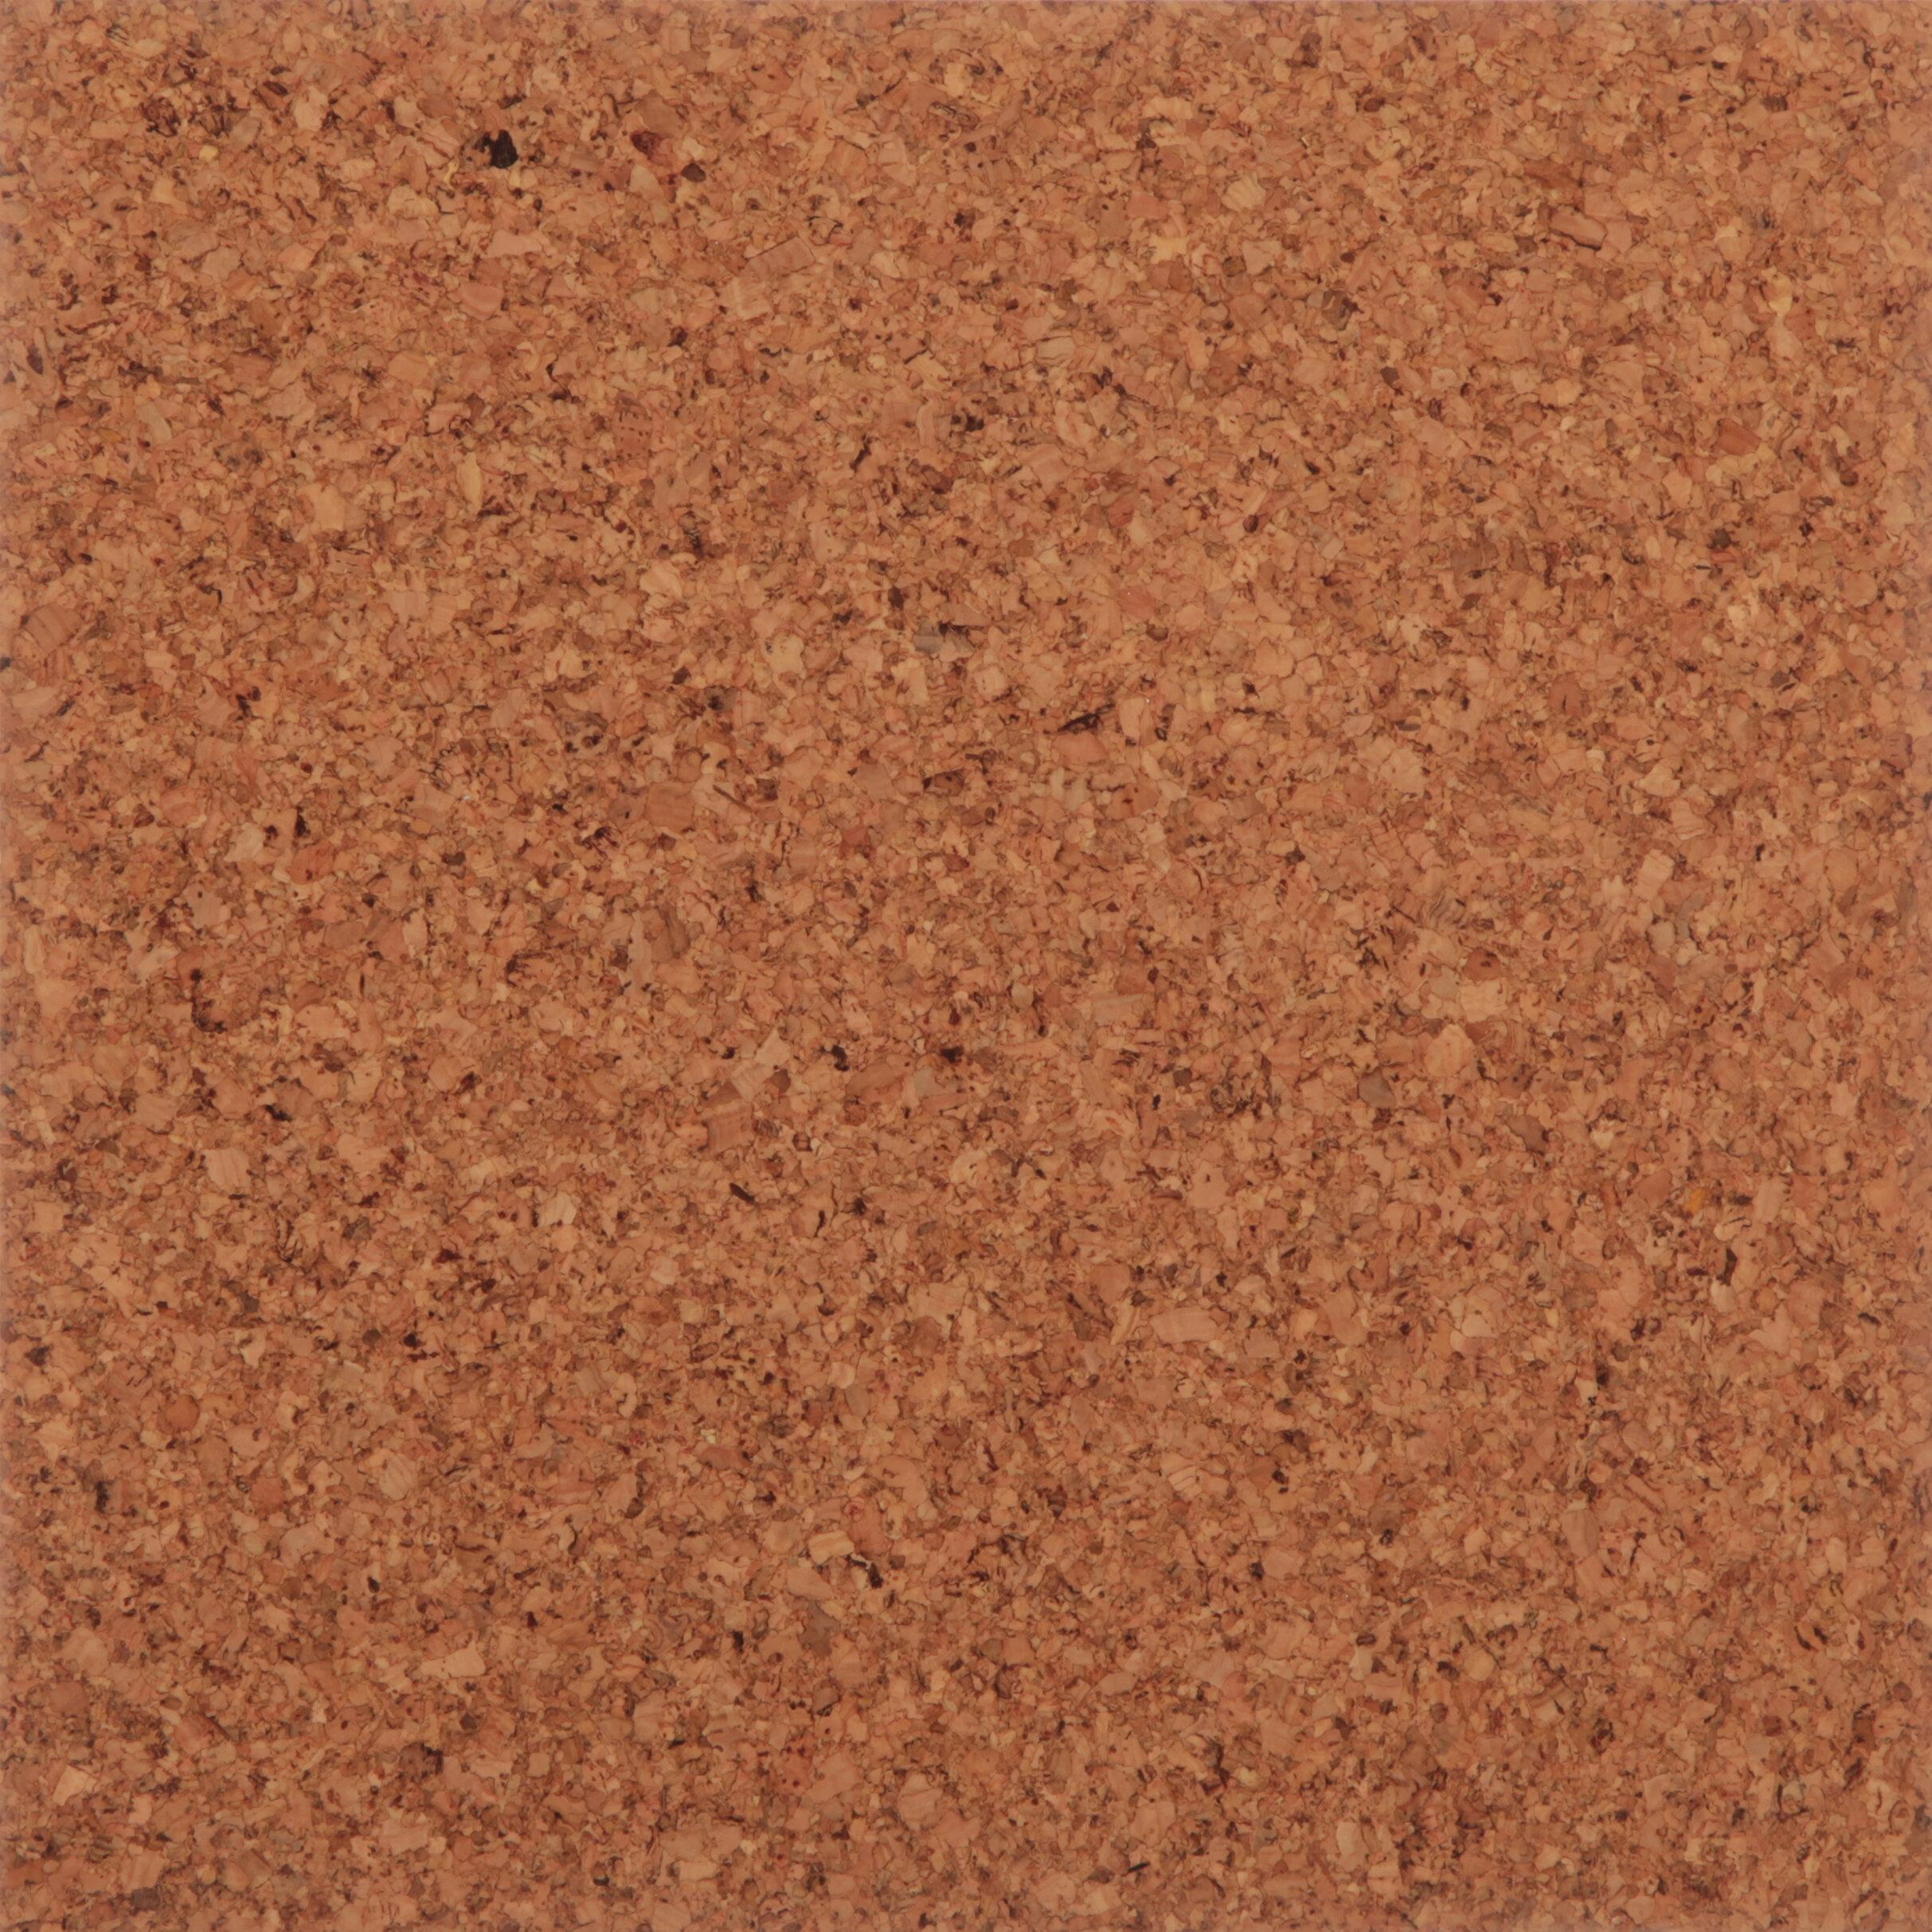 Apc cork floor tiles 12 cork flooring in sandy reviews wayfair dailygadgetfo Gallery